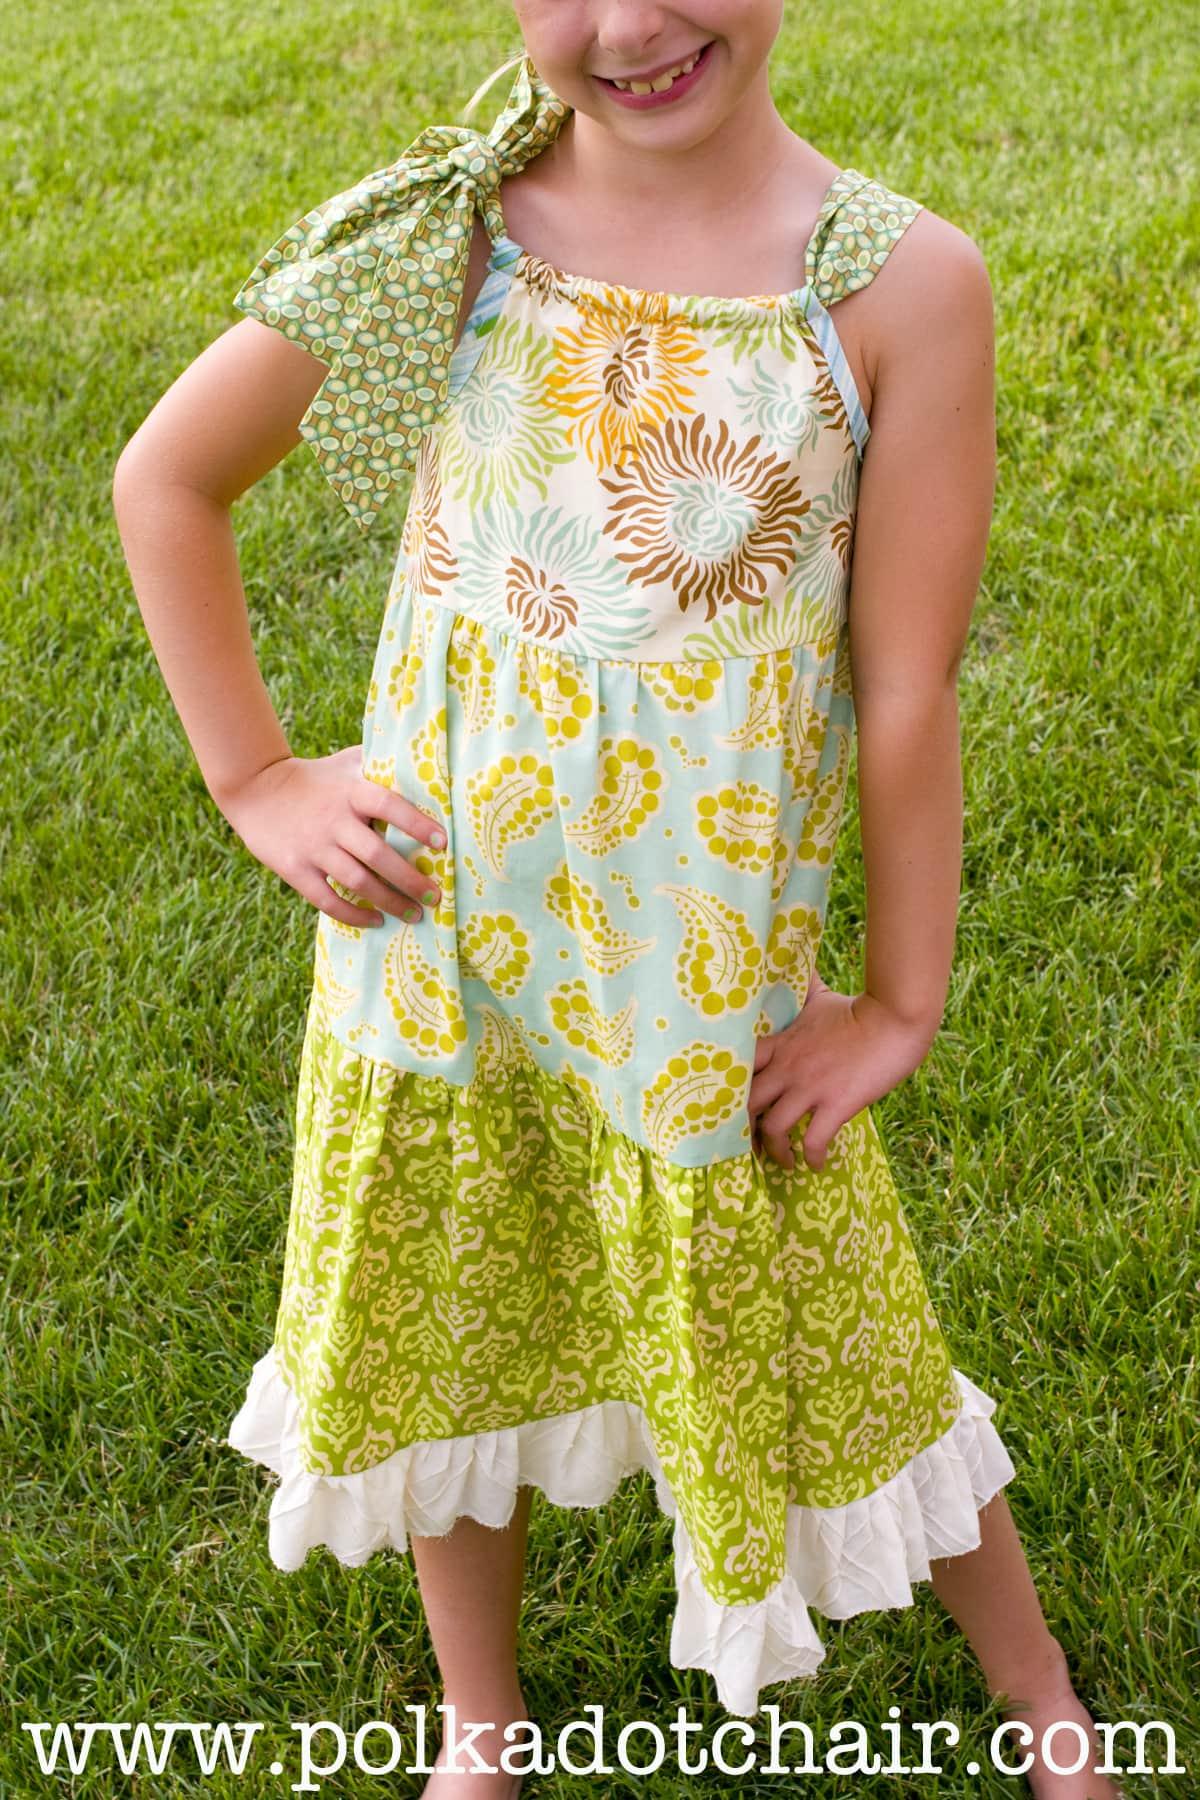 Tuesday Tutorial: Tiered Pillowcase Dress - The Polkadot Chair